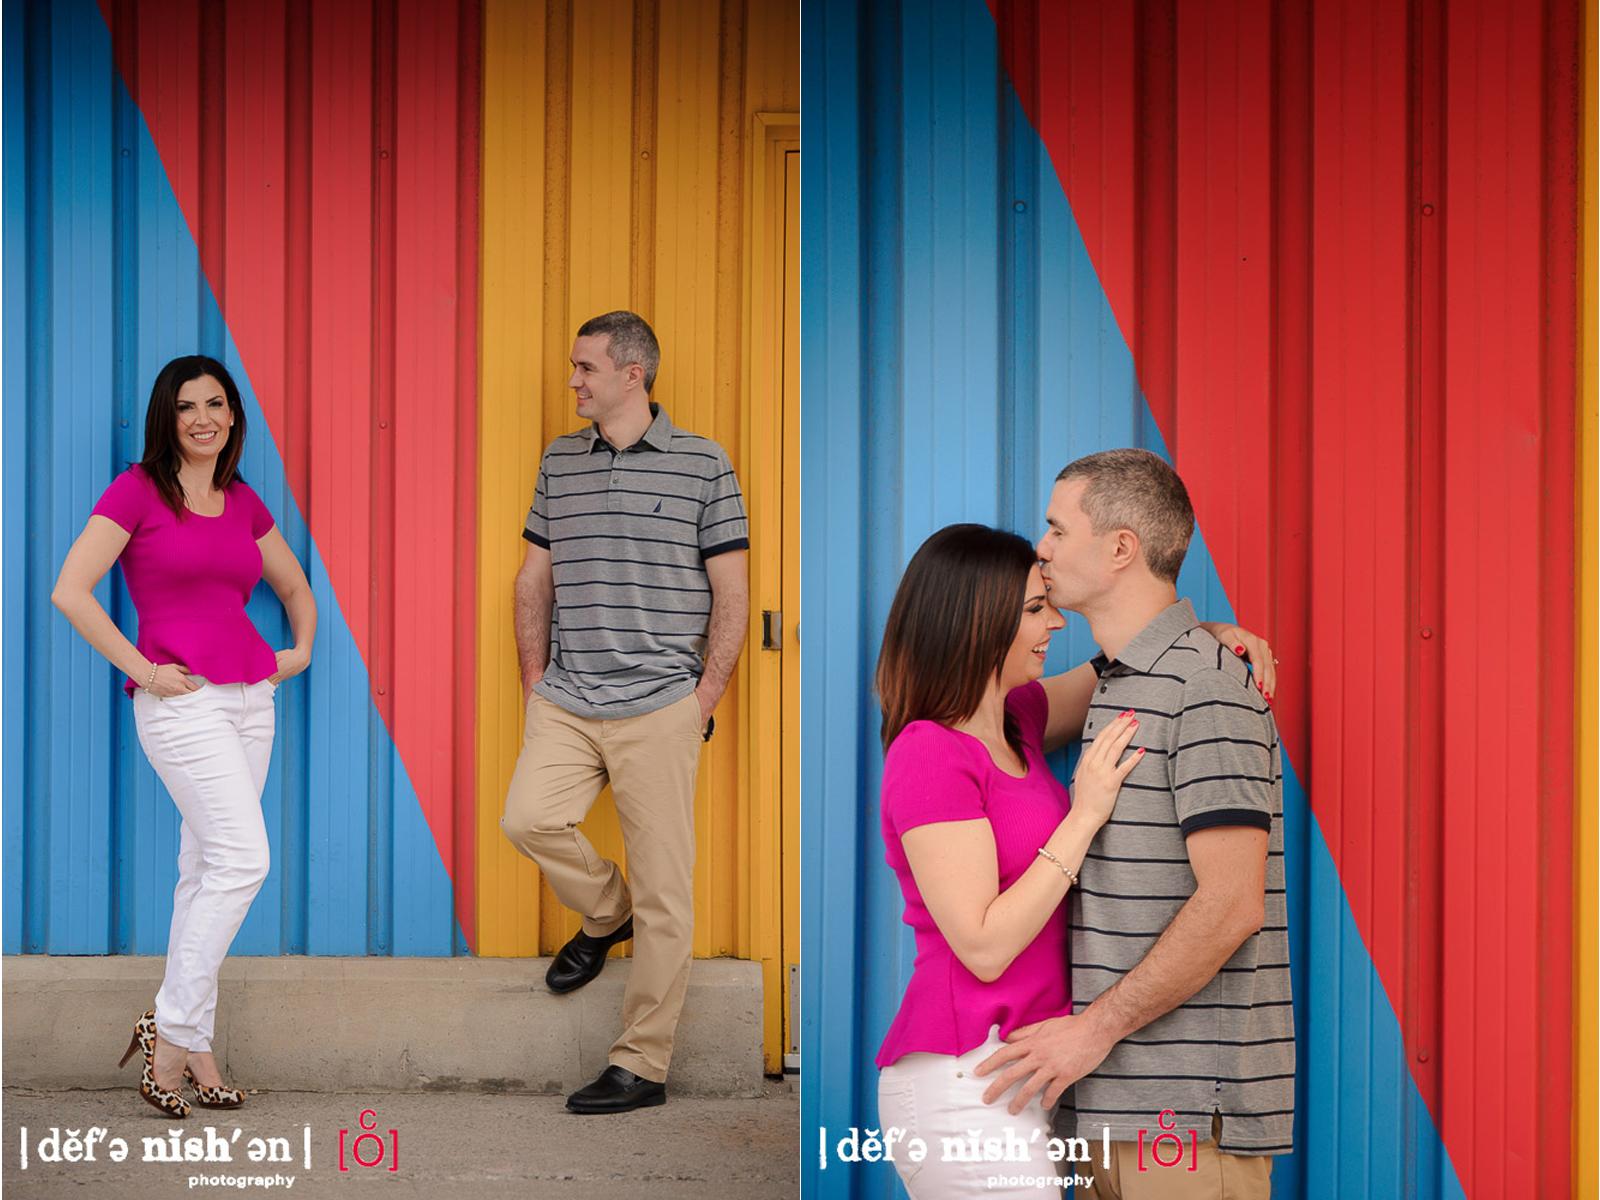 definition photography liberty village (8).jpg